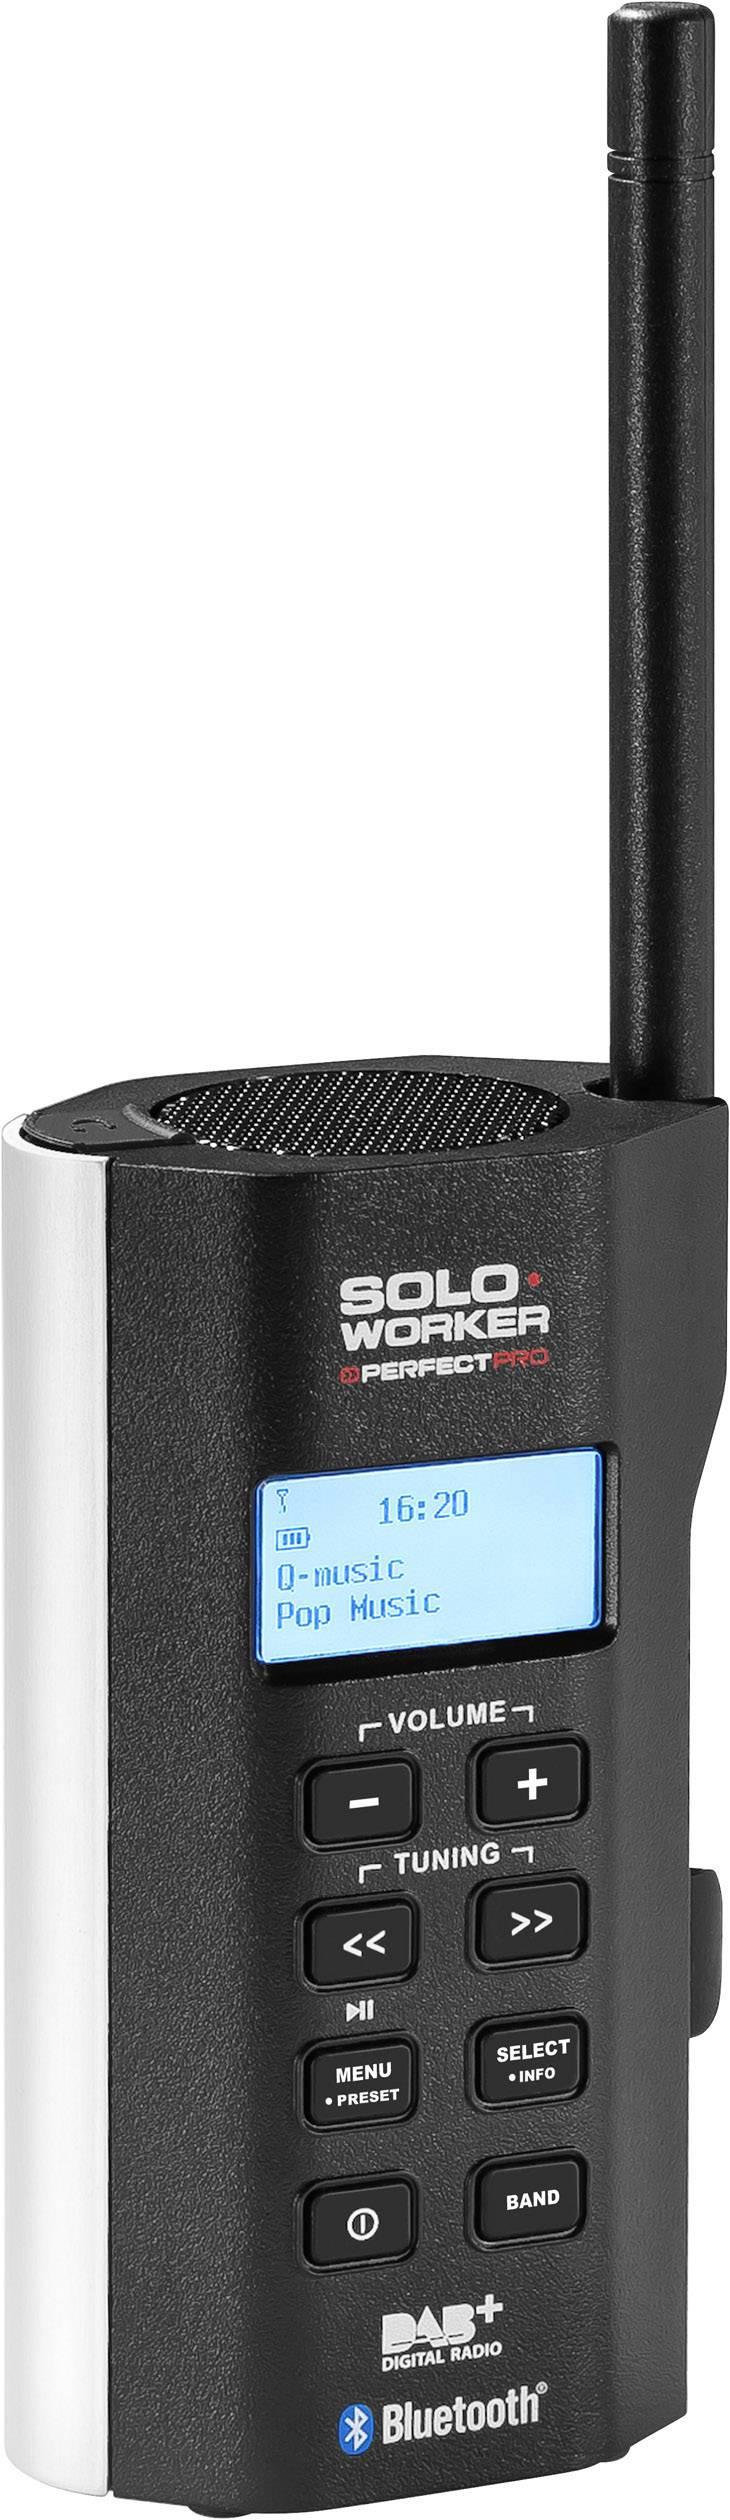 DAB+ rádio na stavbu PerfectPro Soloworker DAB+ BT AUX, Bluetooth čierna